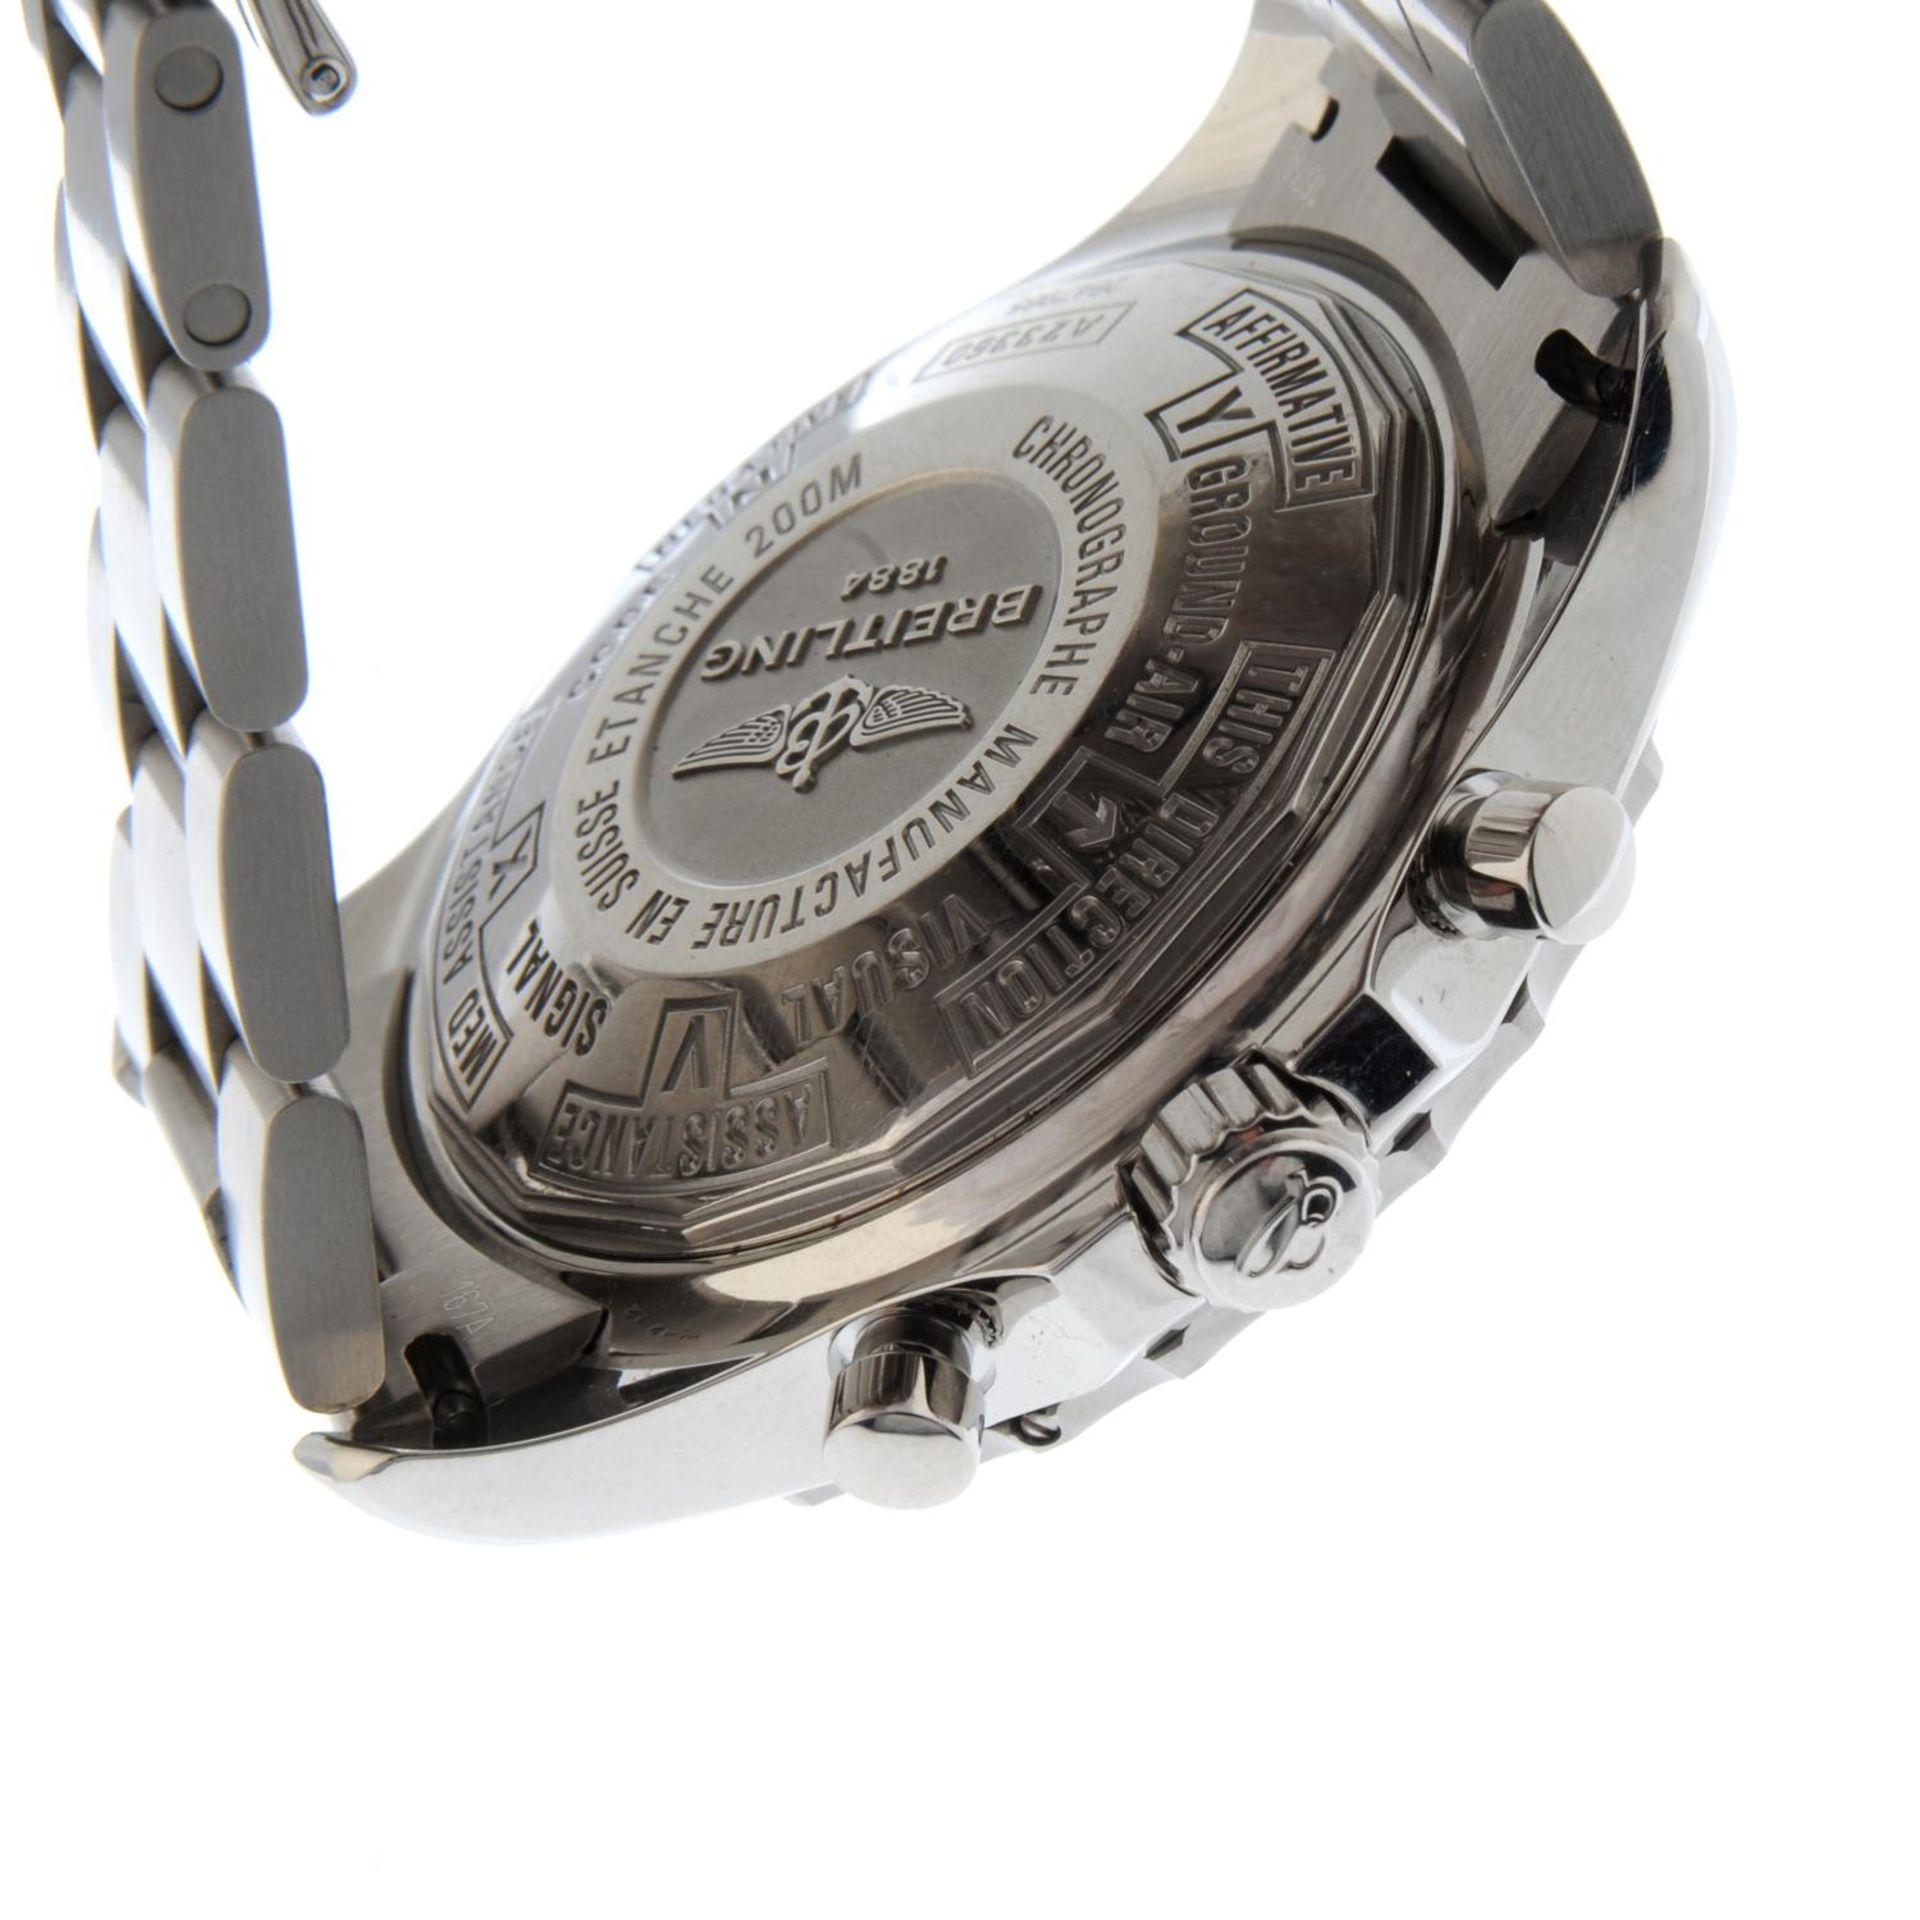 BREITLING - a Chronospace chronograph bracelet watch. - Bild 2 aus 5